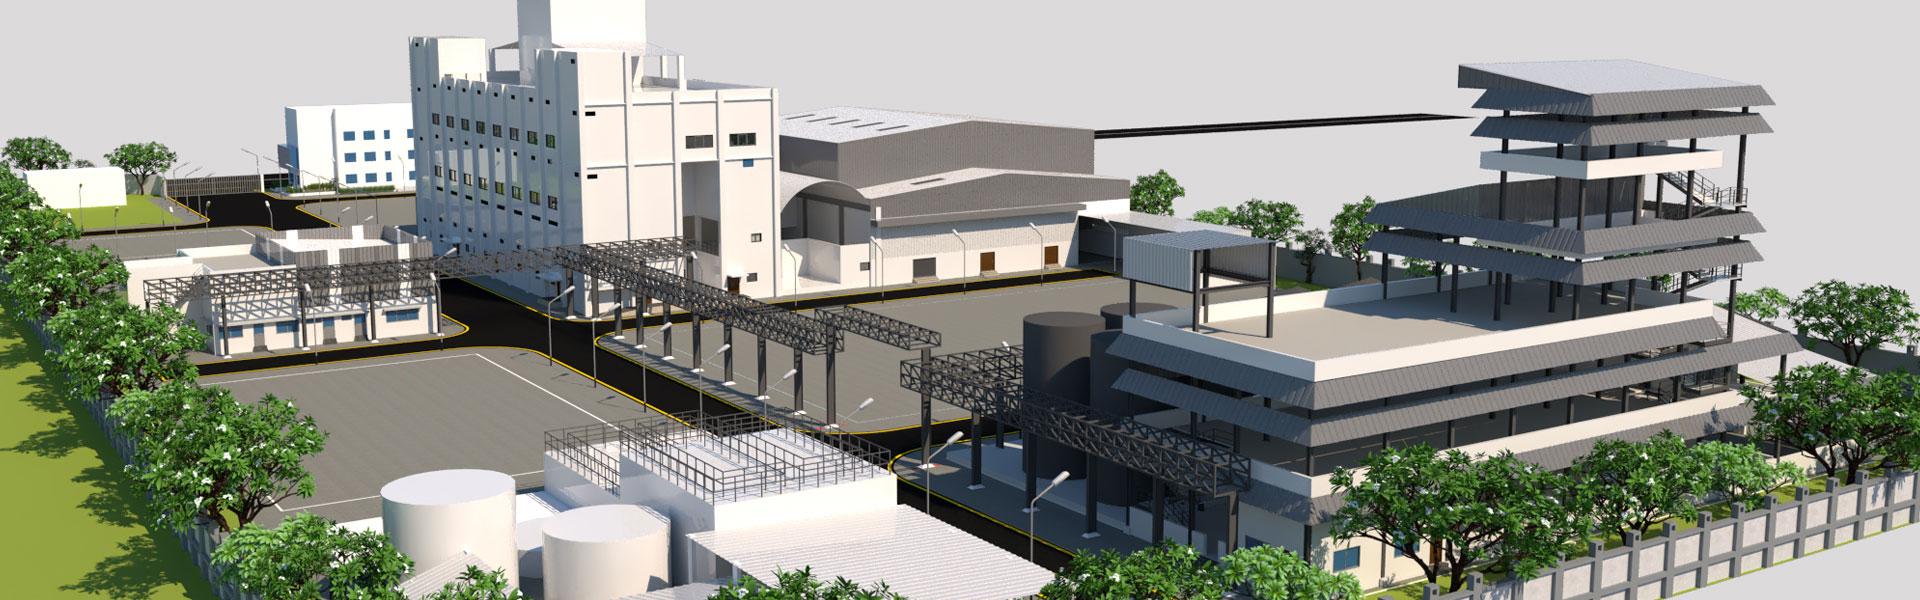 meghmani-plant-01